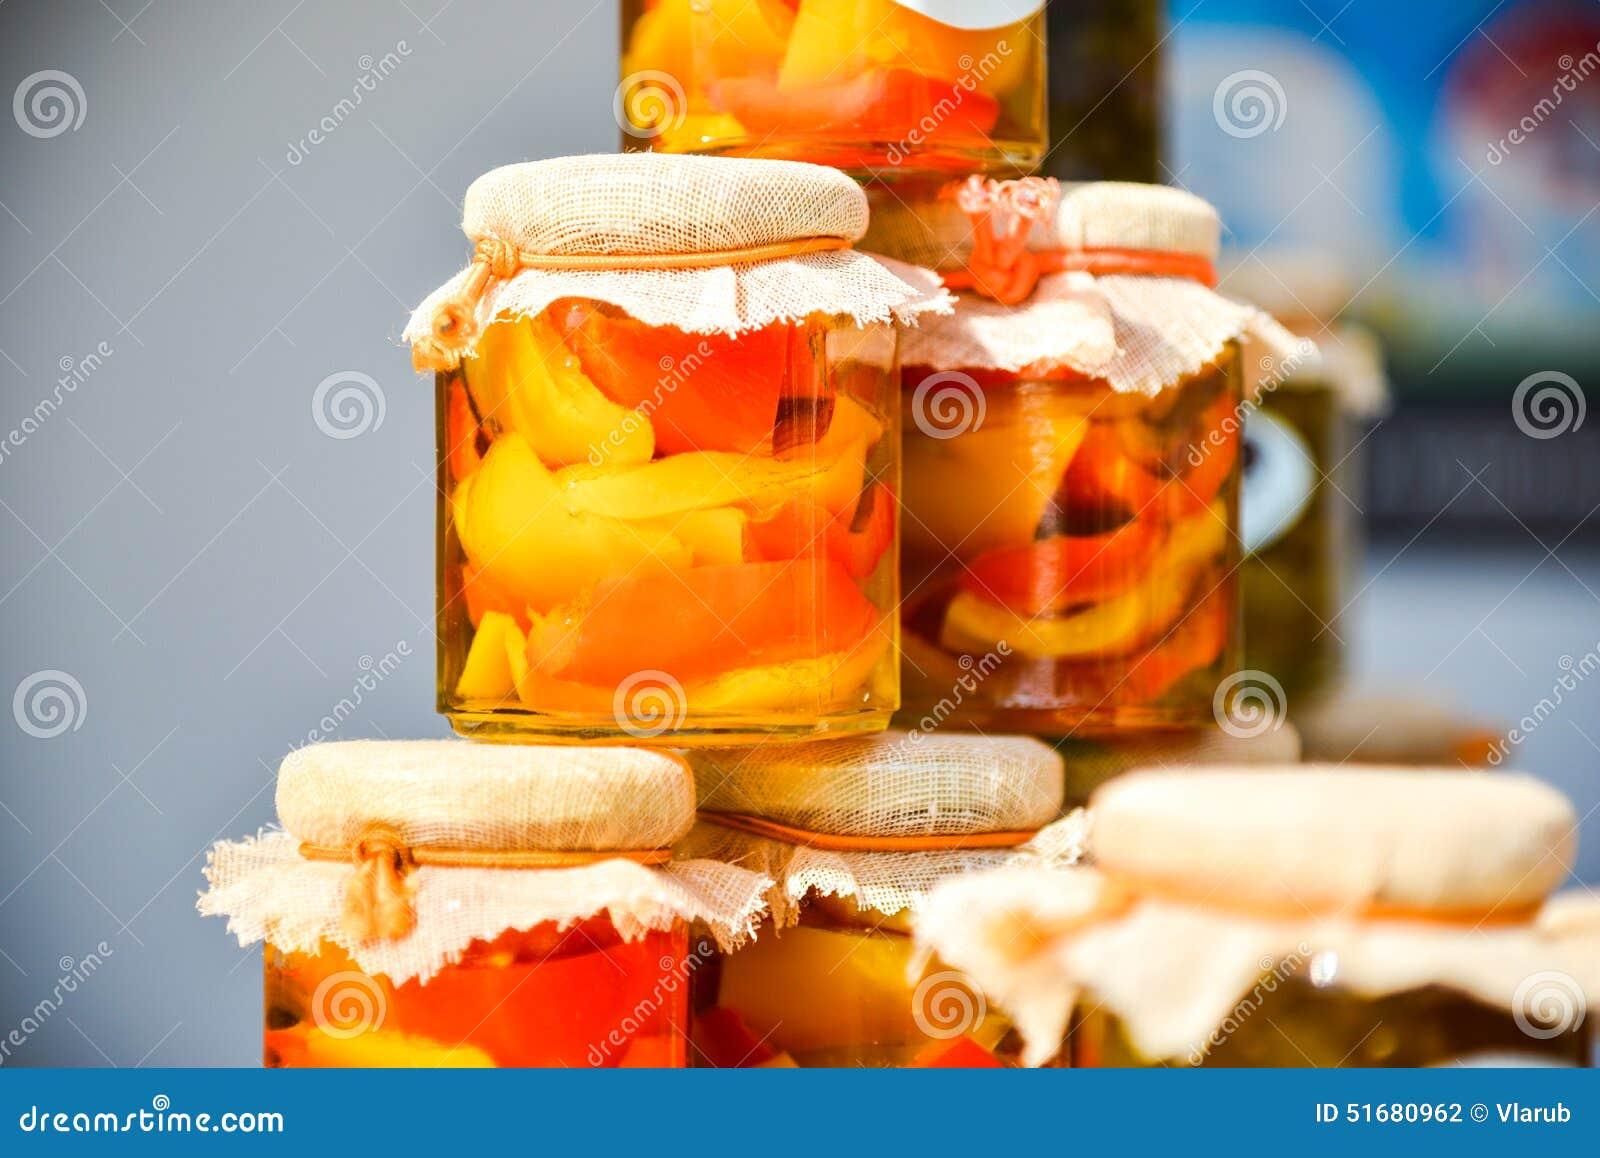 Peppers in jars